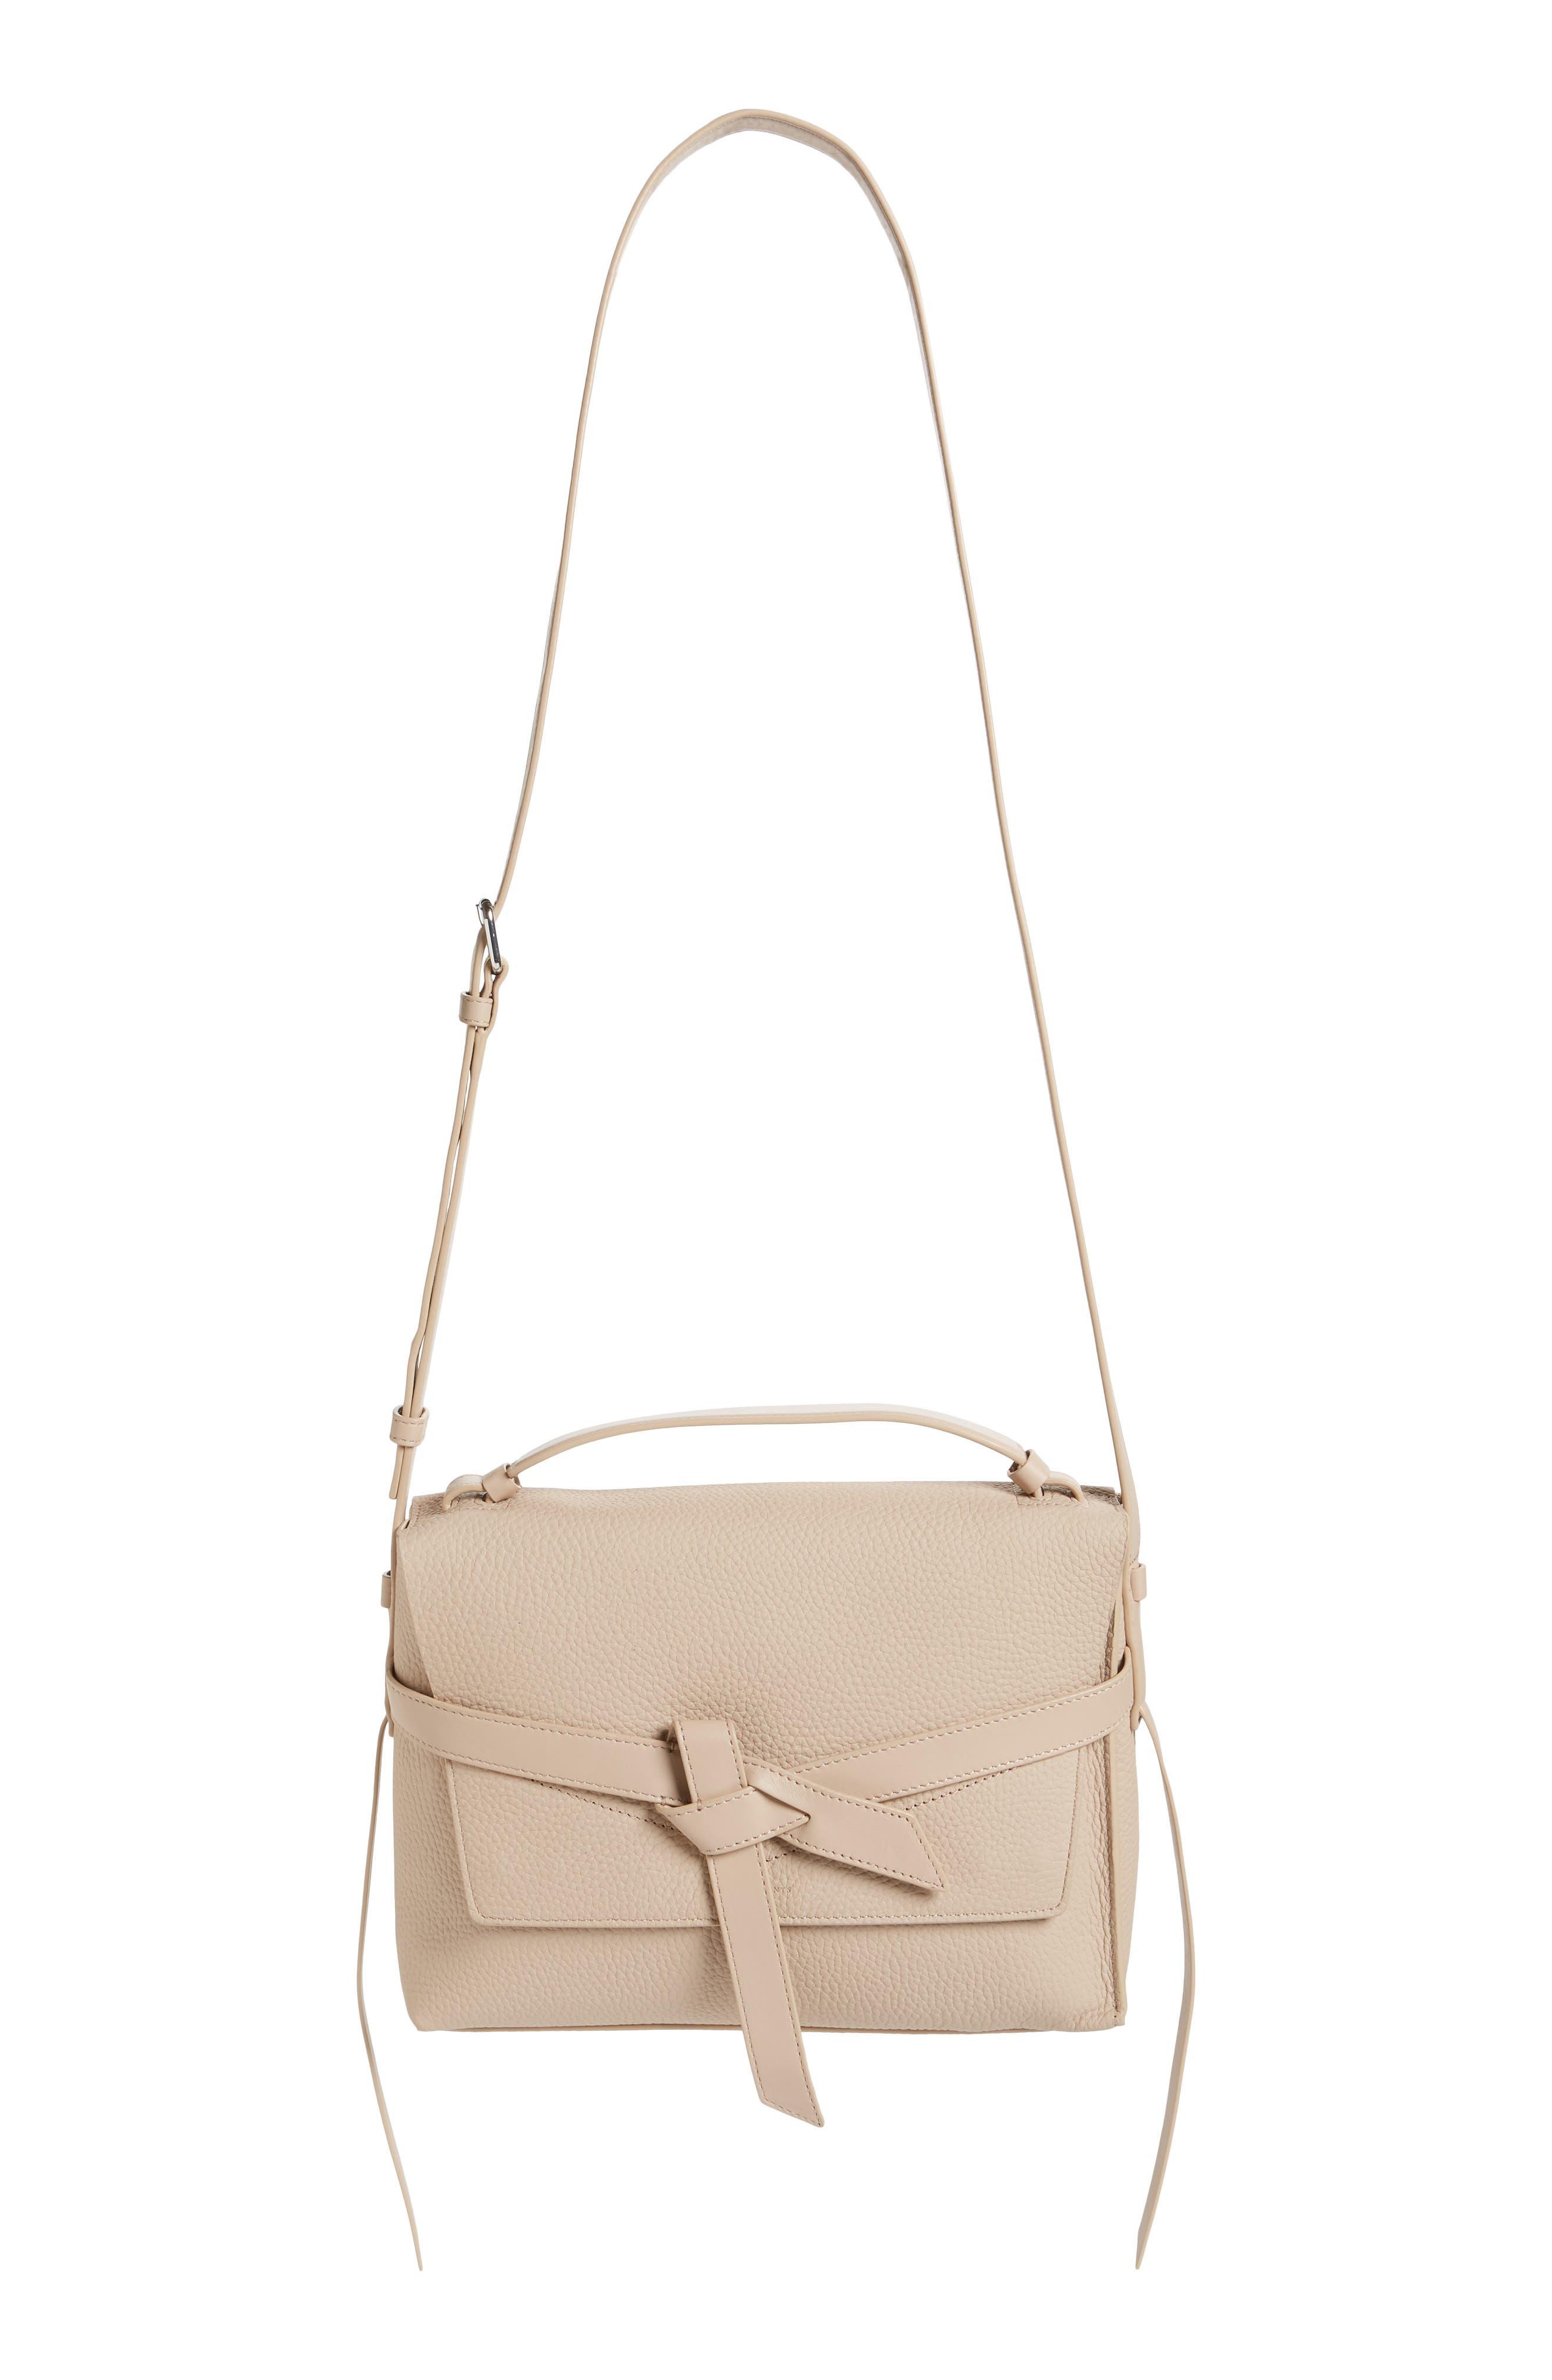 Cami Leather Shoulder Bag,                             Main thumbnail 1, color,                             NATURAL